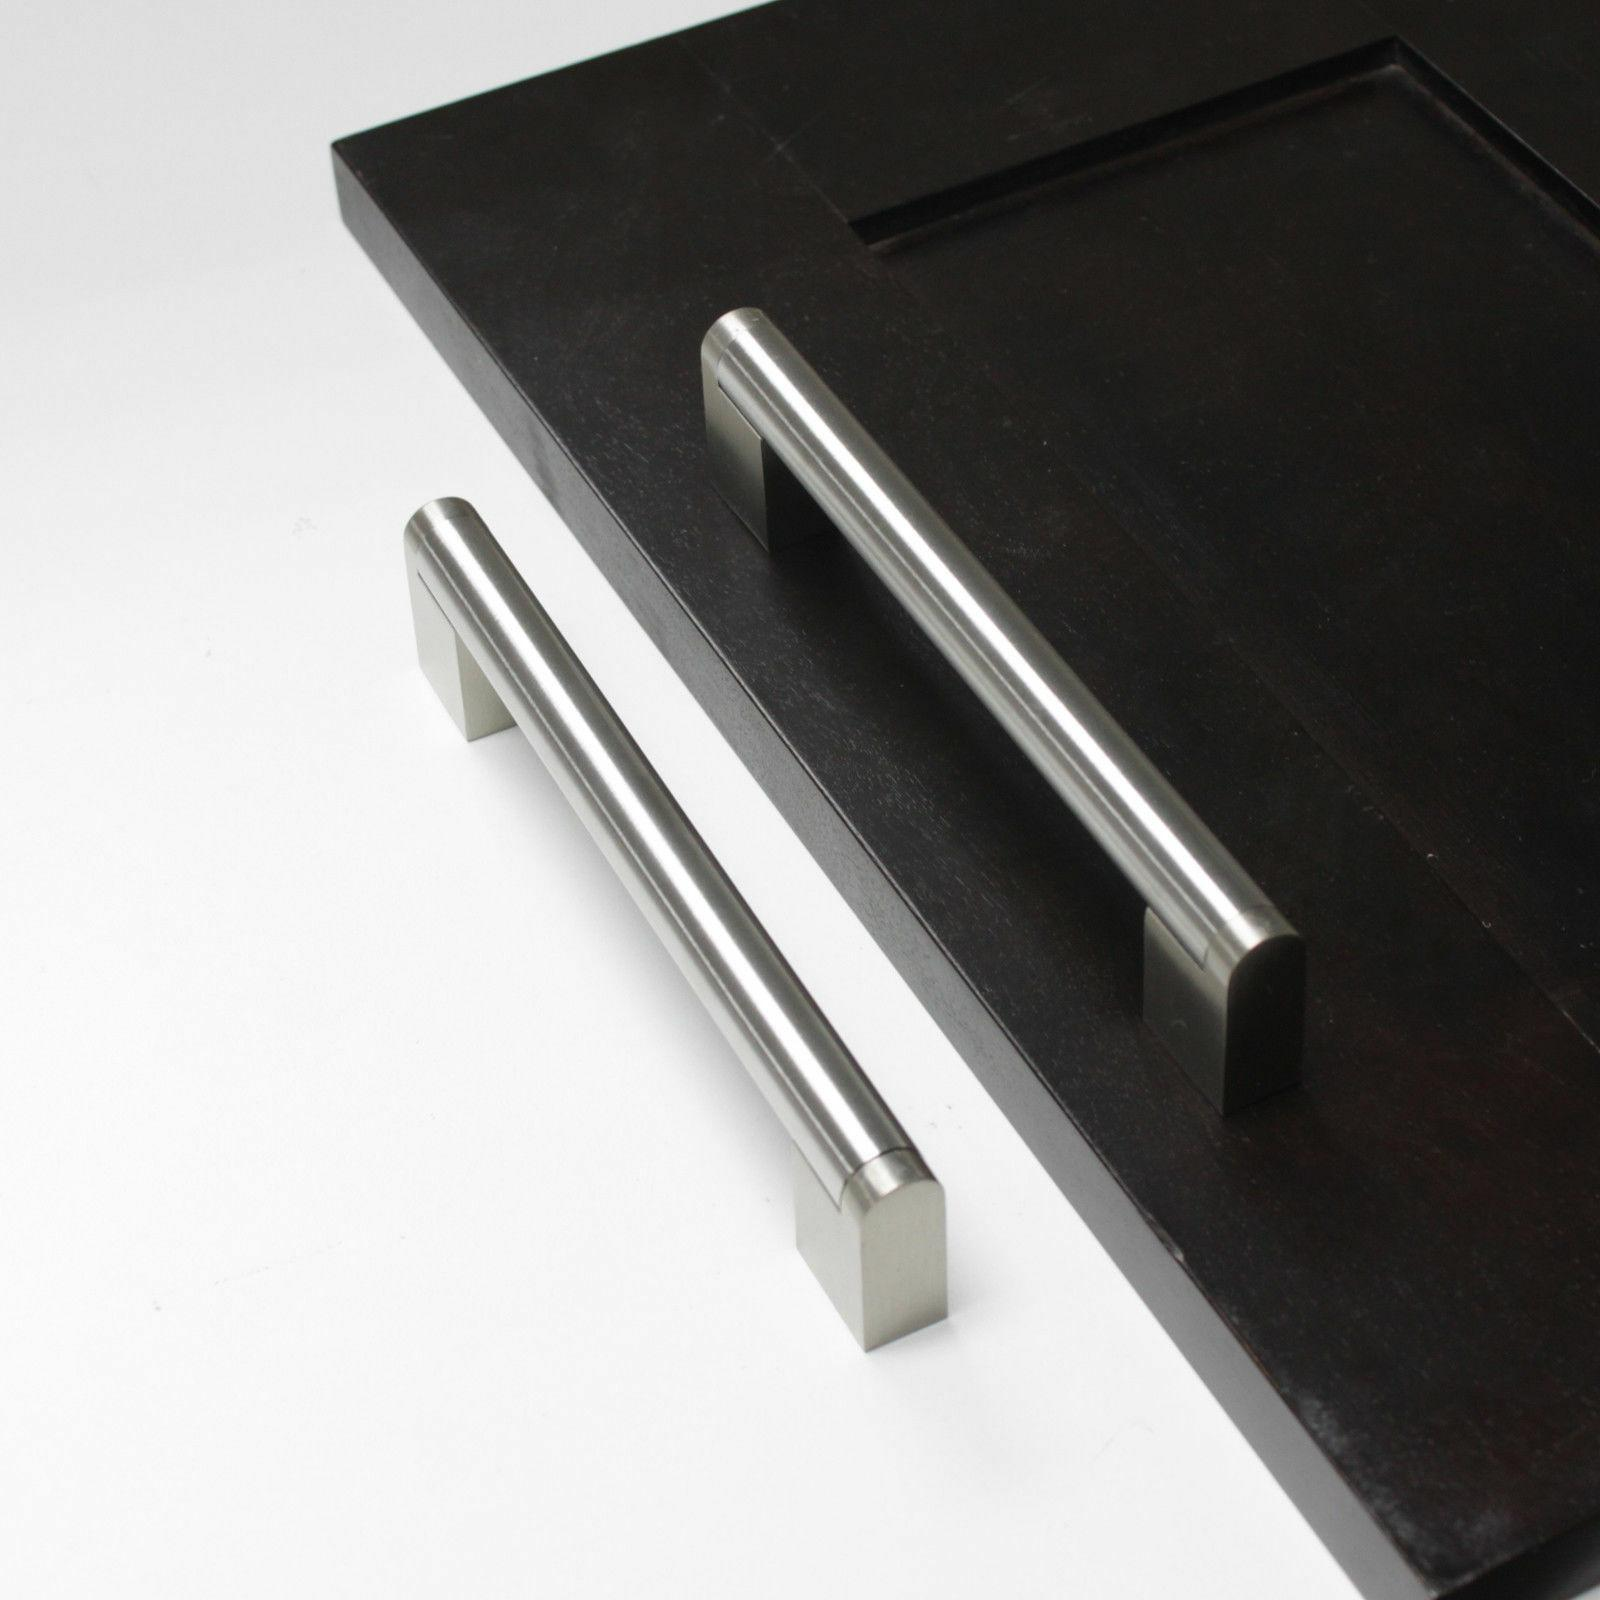 Brushed Nickel Cabinet Pulls Knobs Bar